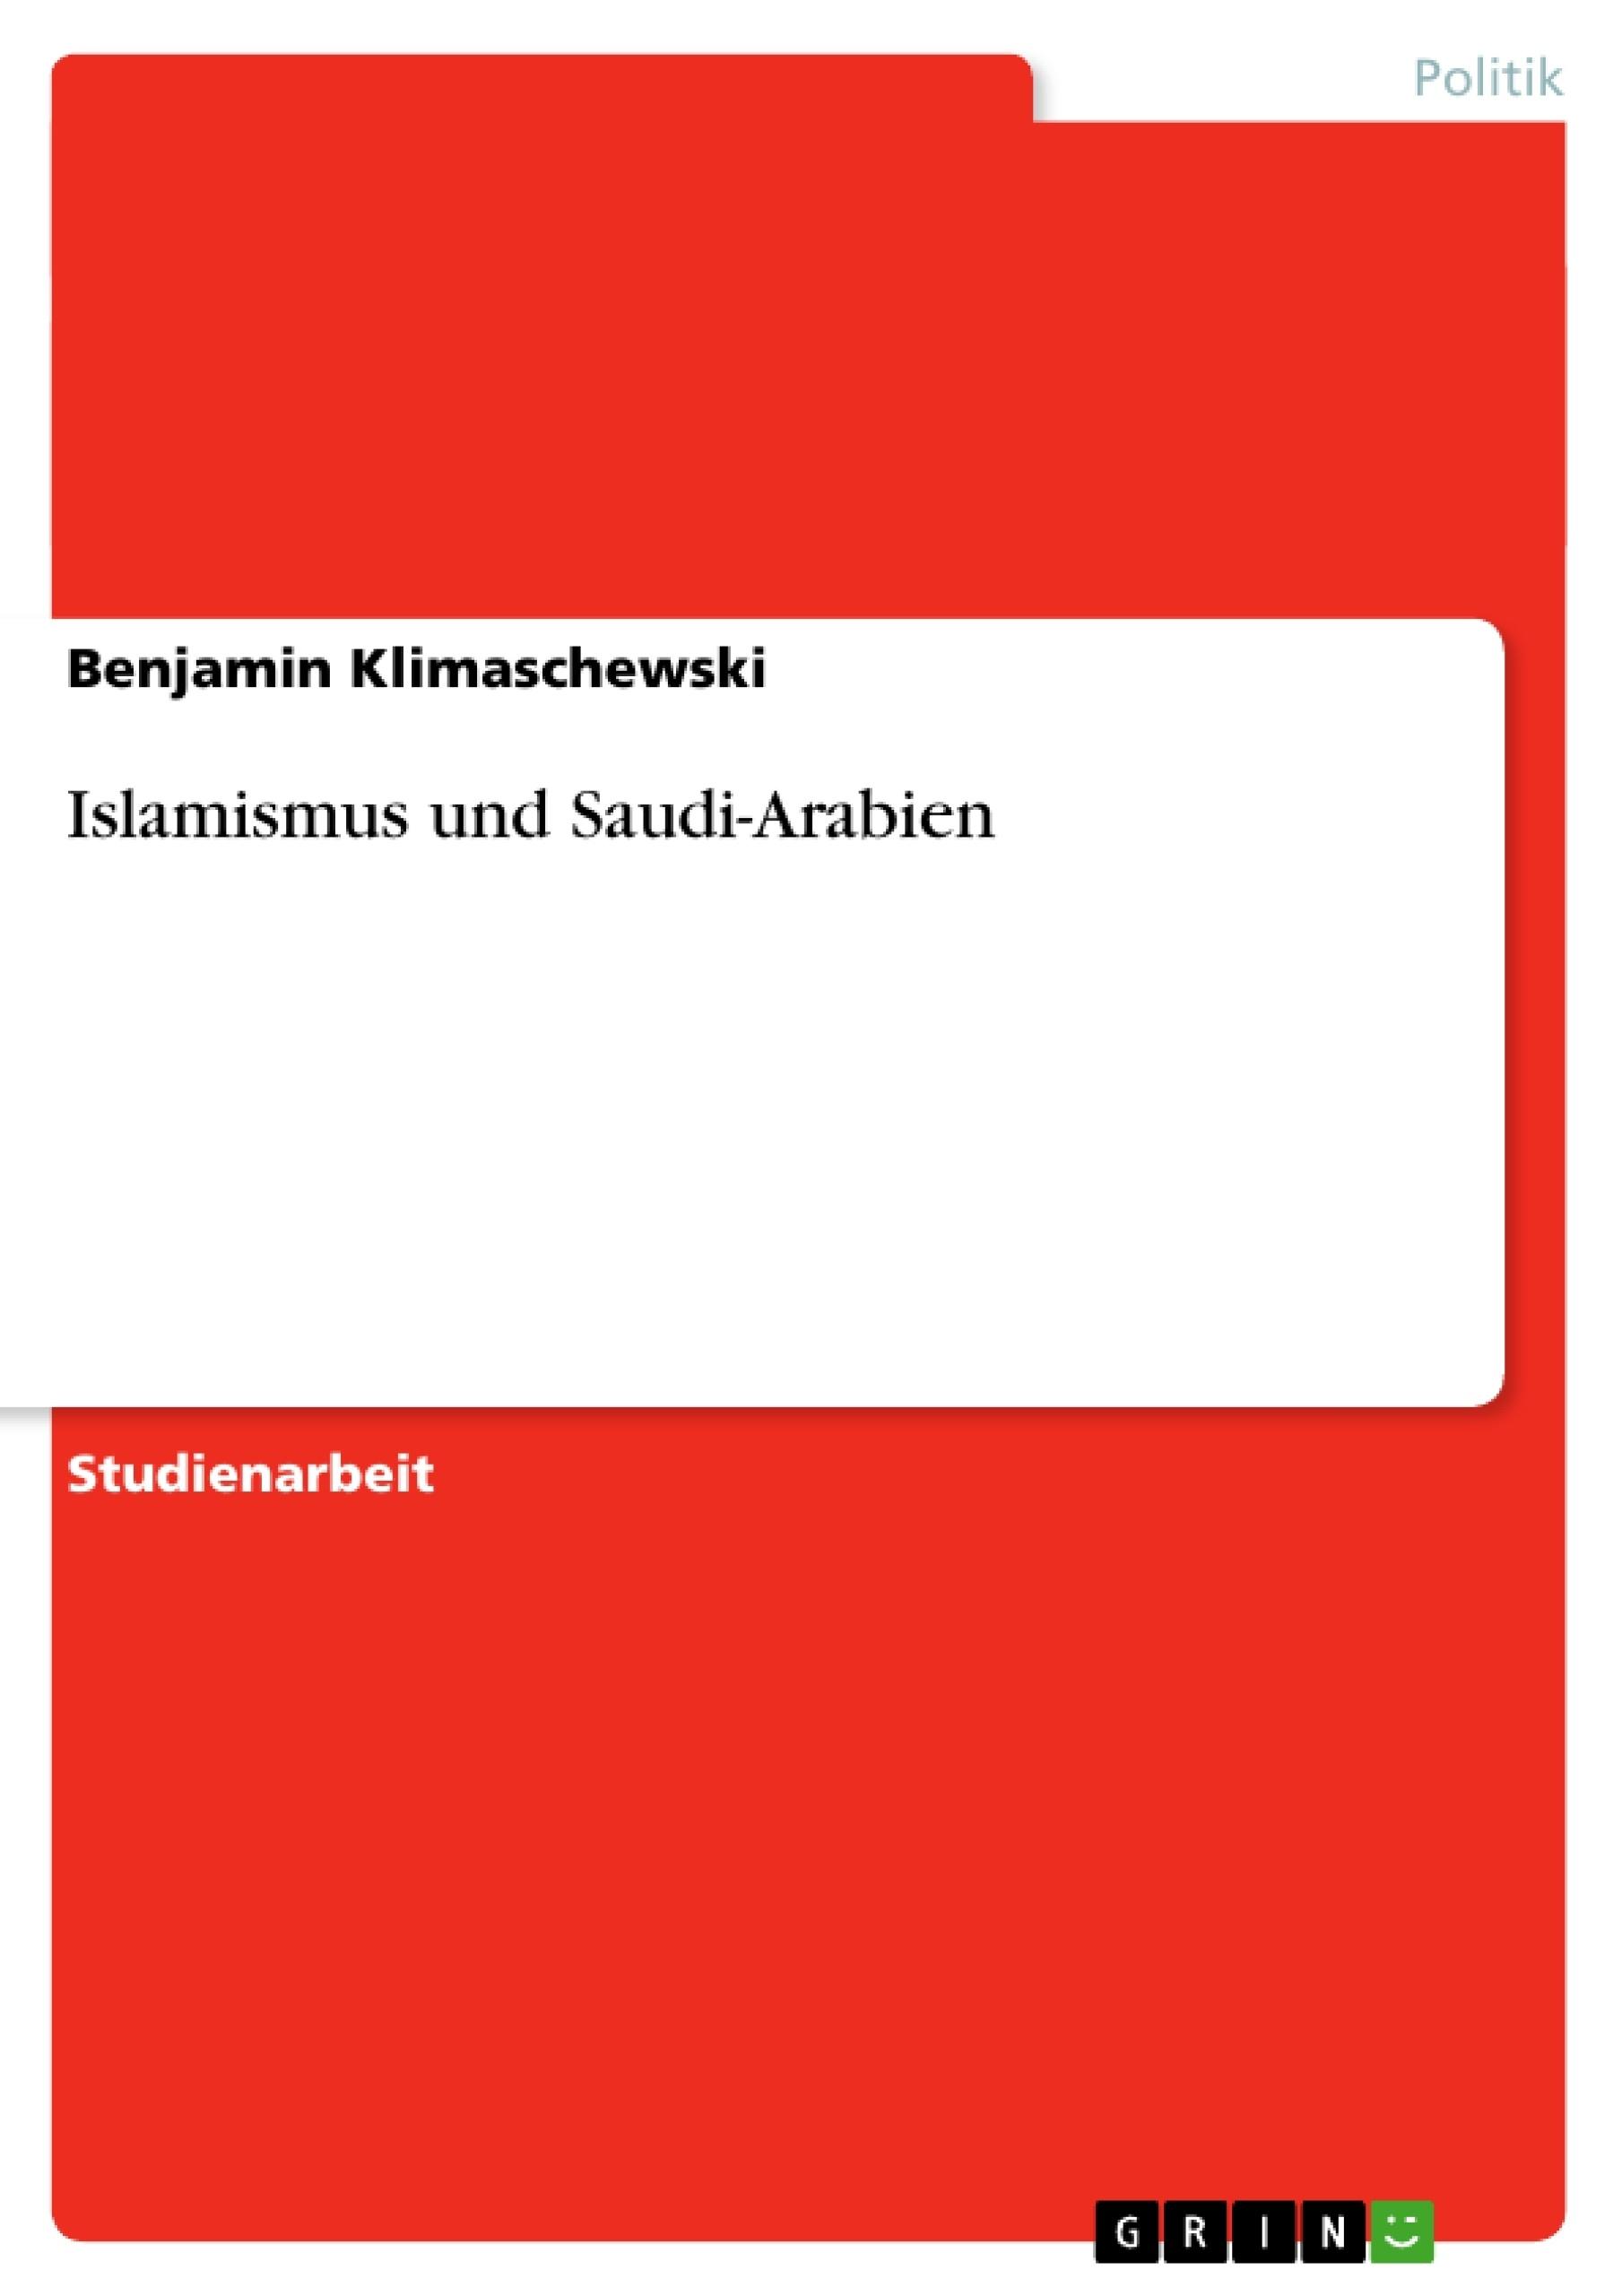 Titel: Islamismus und Saudi-Arabien